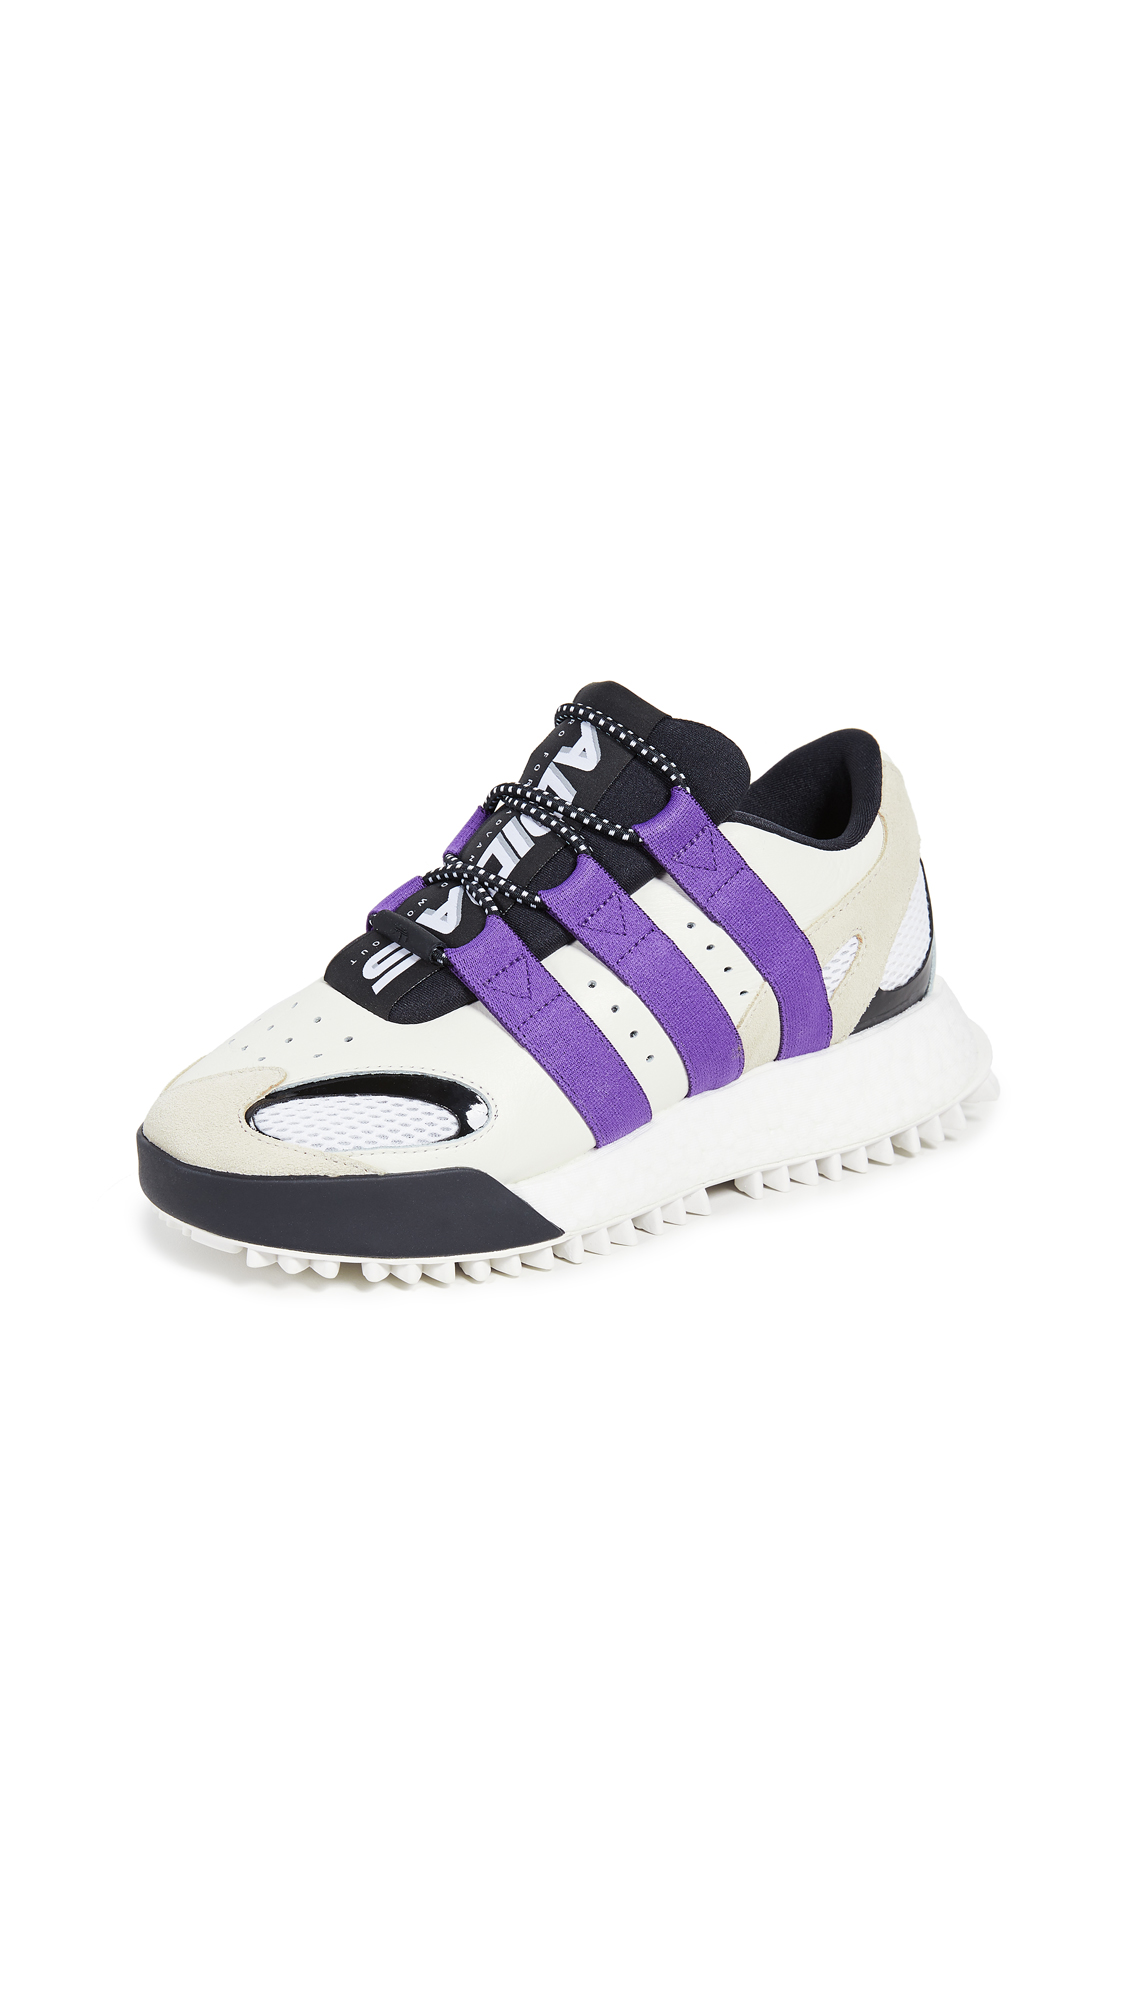 adidas Originals by Alexander Wang AW Wangbody Run Sneakers - Cwhite/Shapur/Cbrown